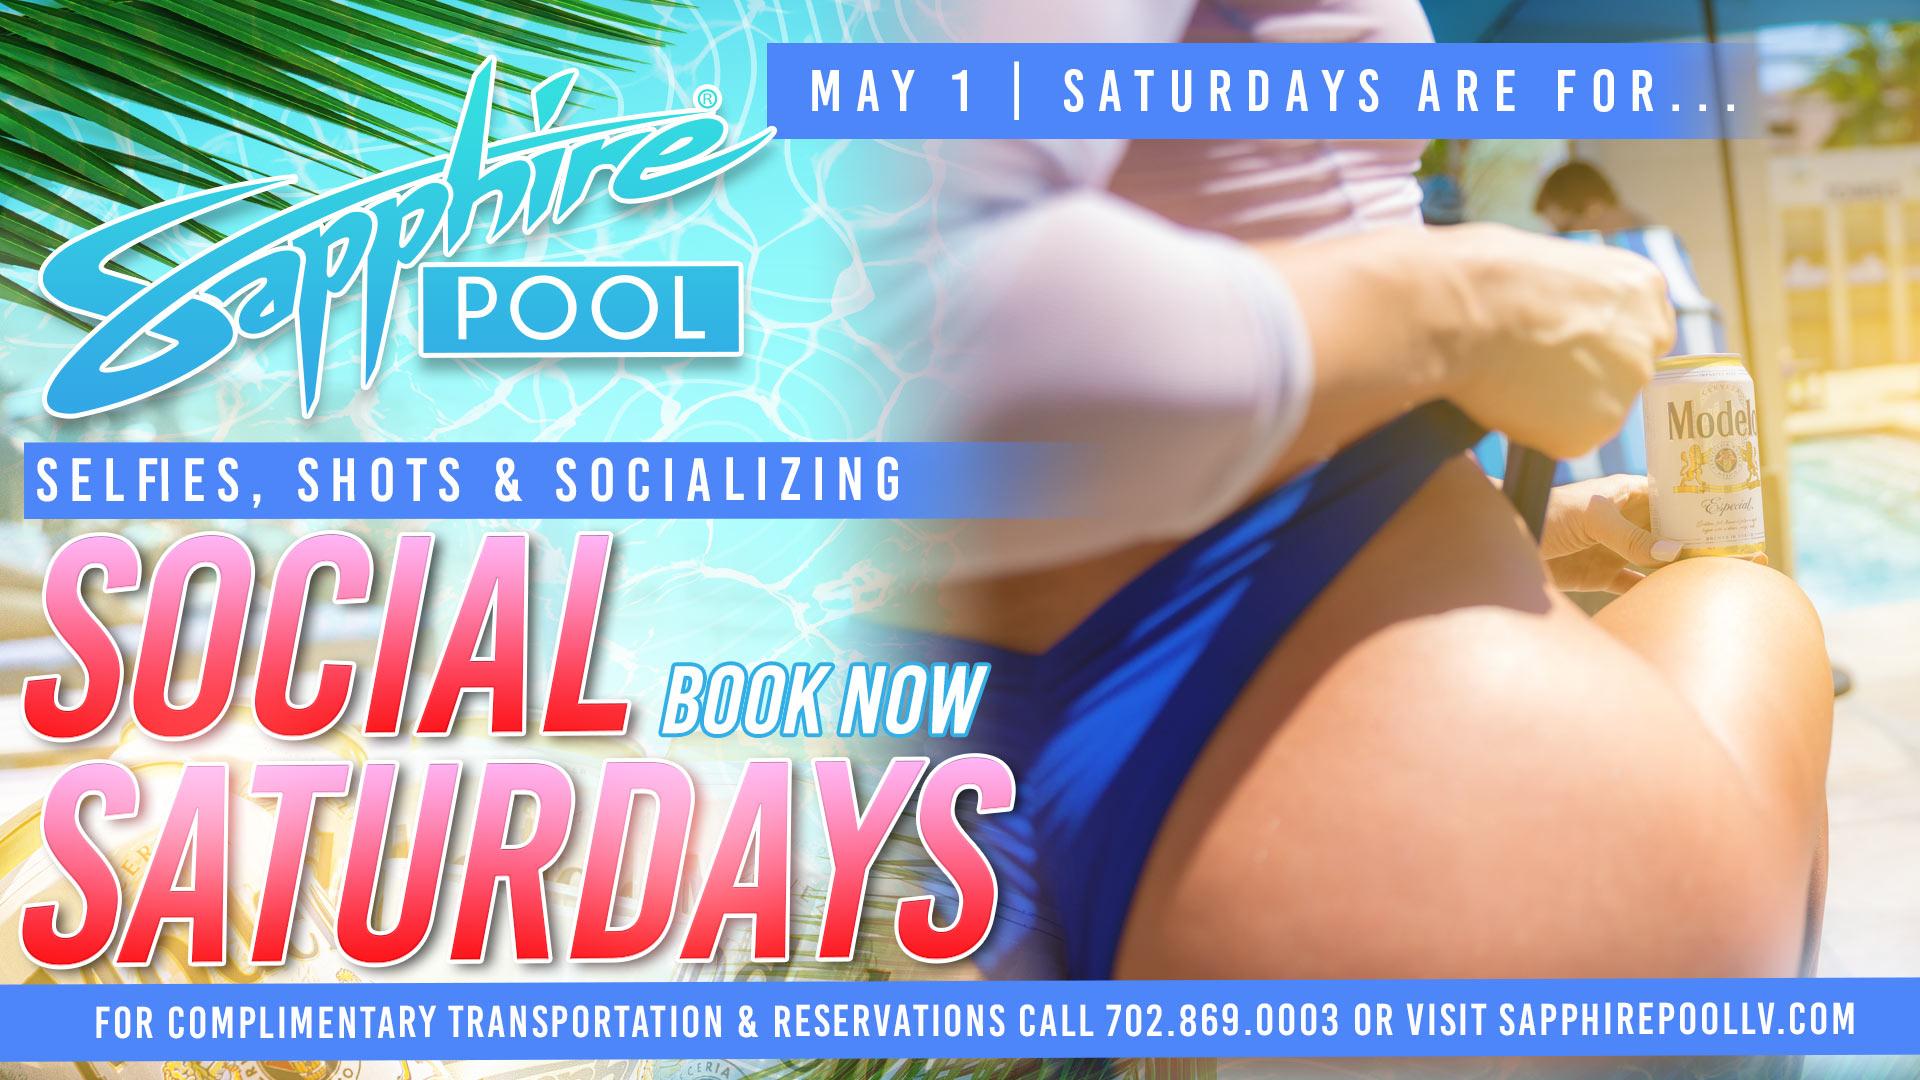 Social Saturdays – May 1 – Poolside in LV